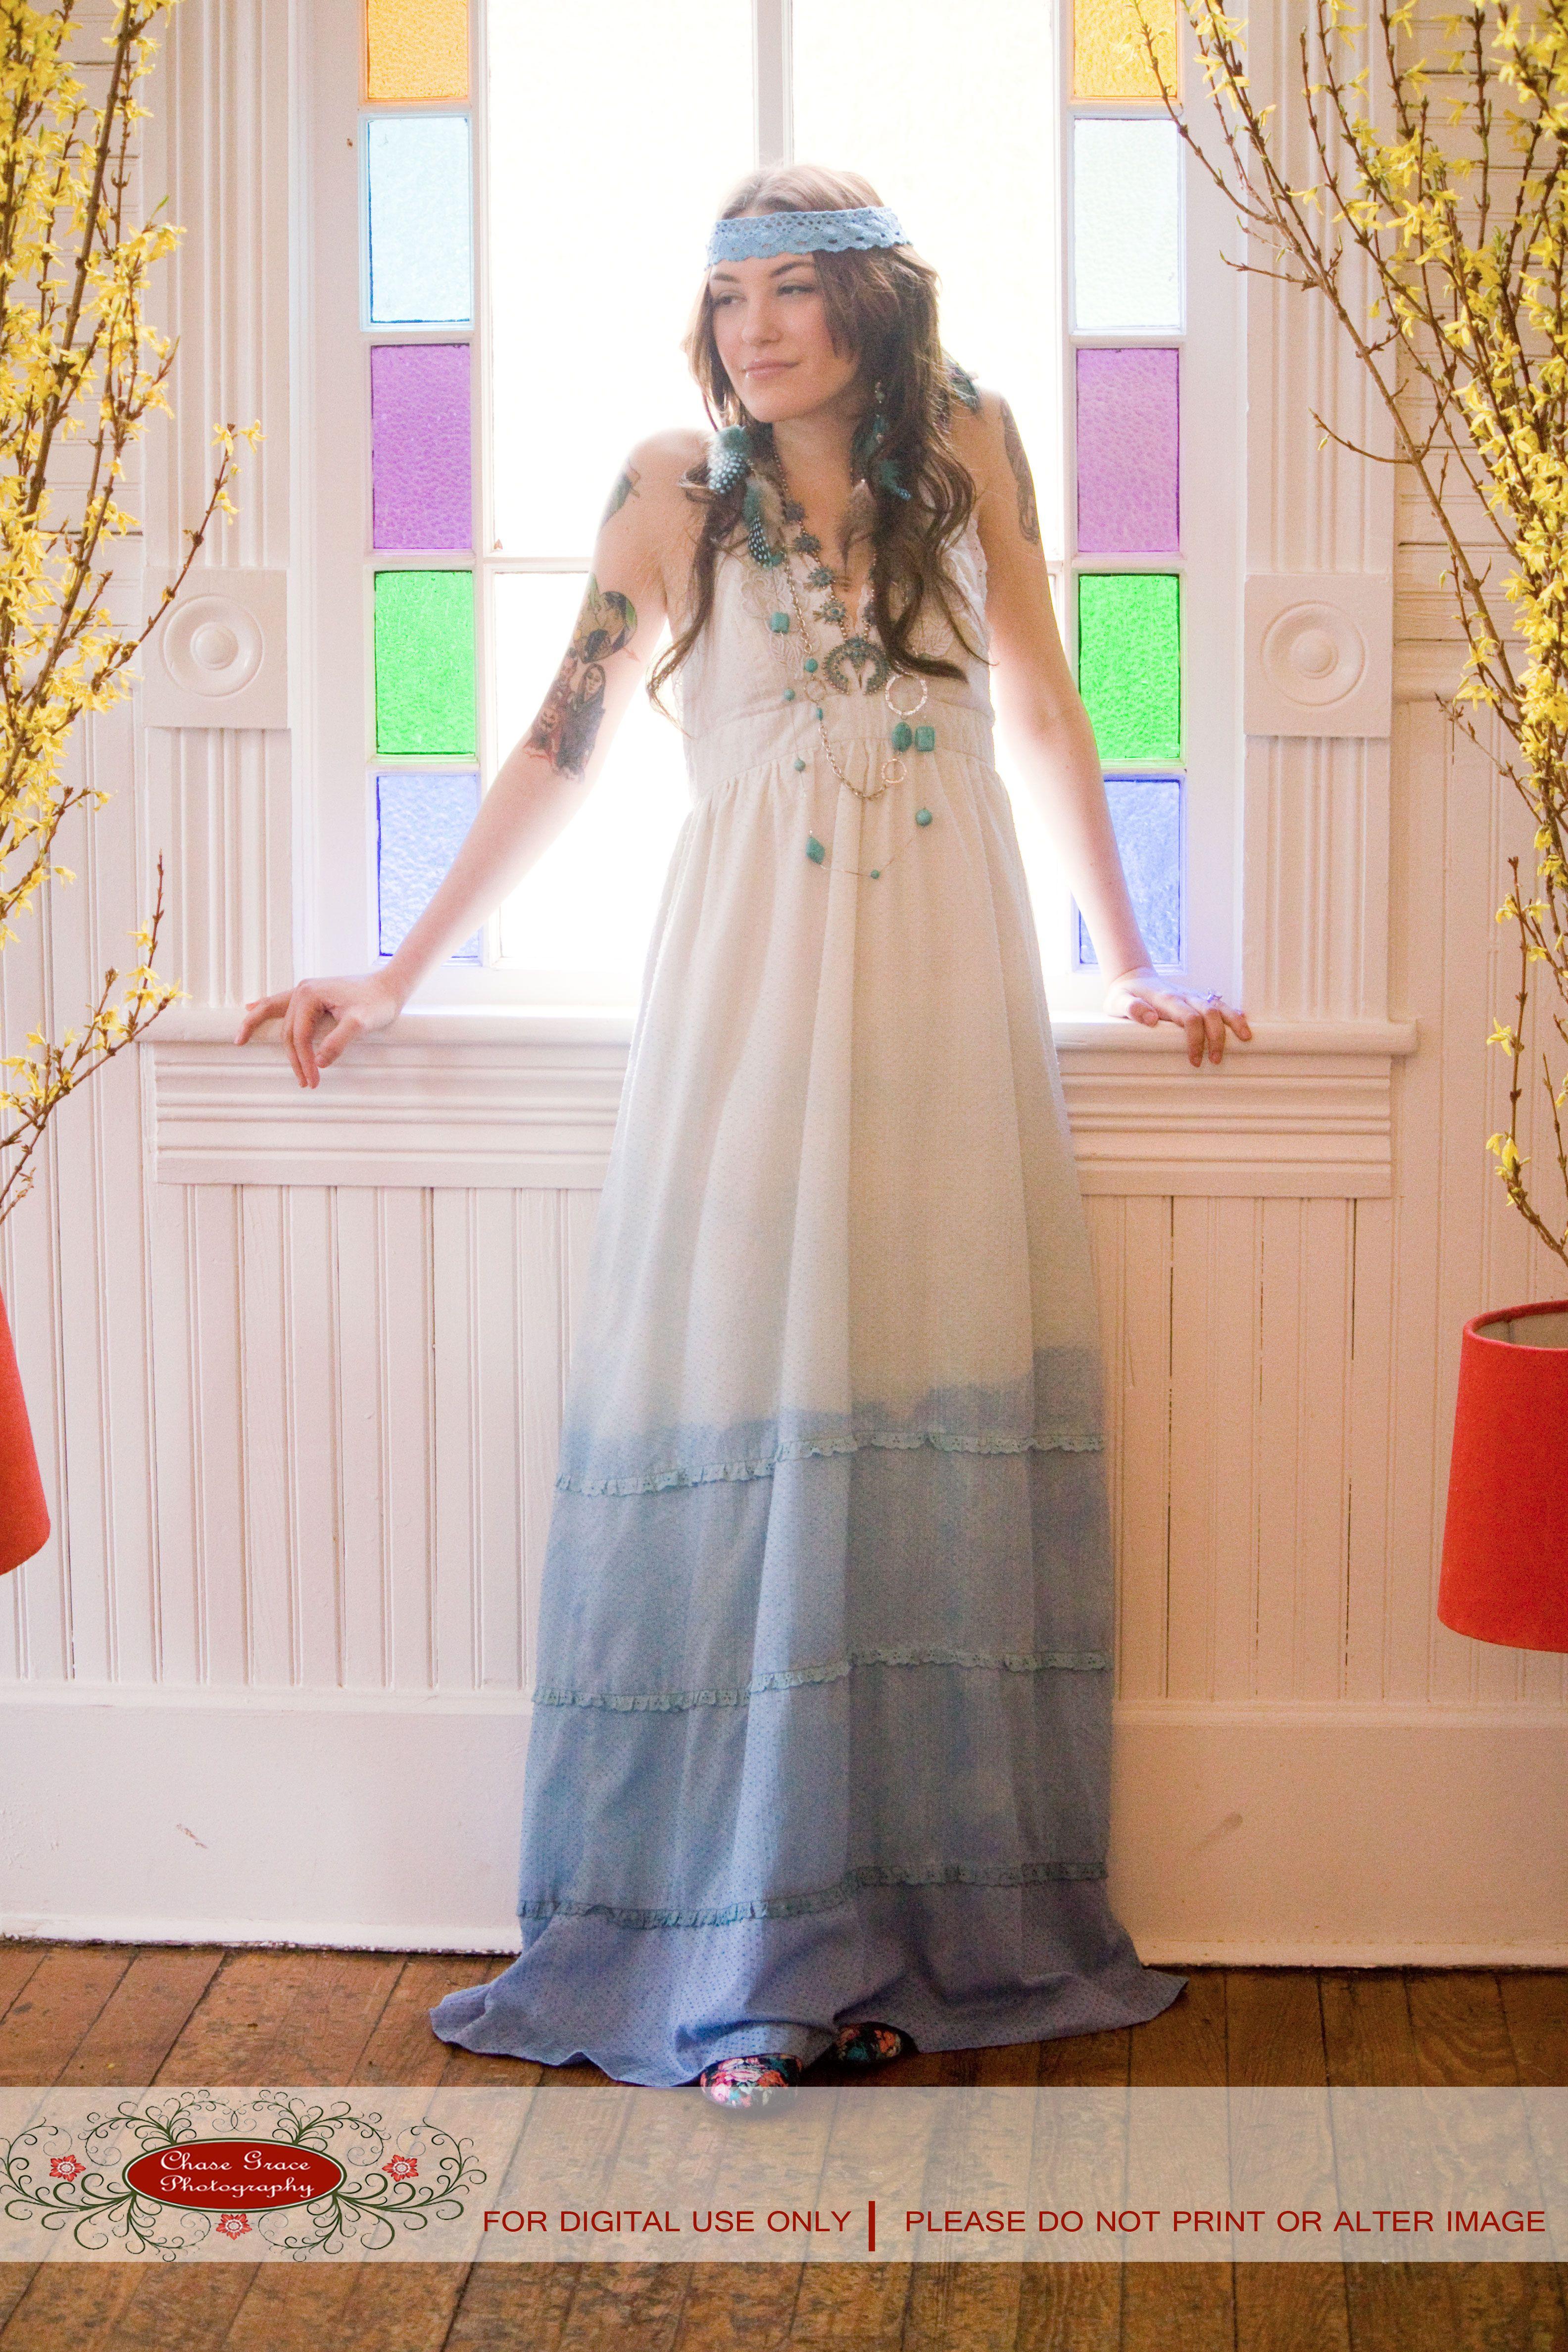 70's theme bride KK's outfit. Wife of the birthday boy | Mi cumple ...